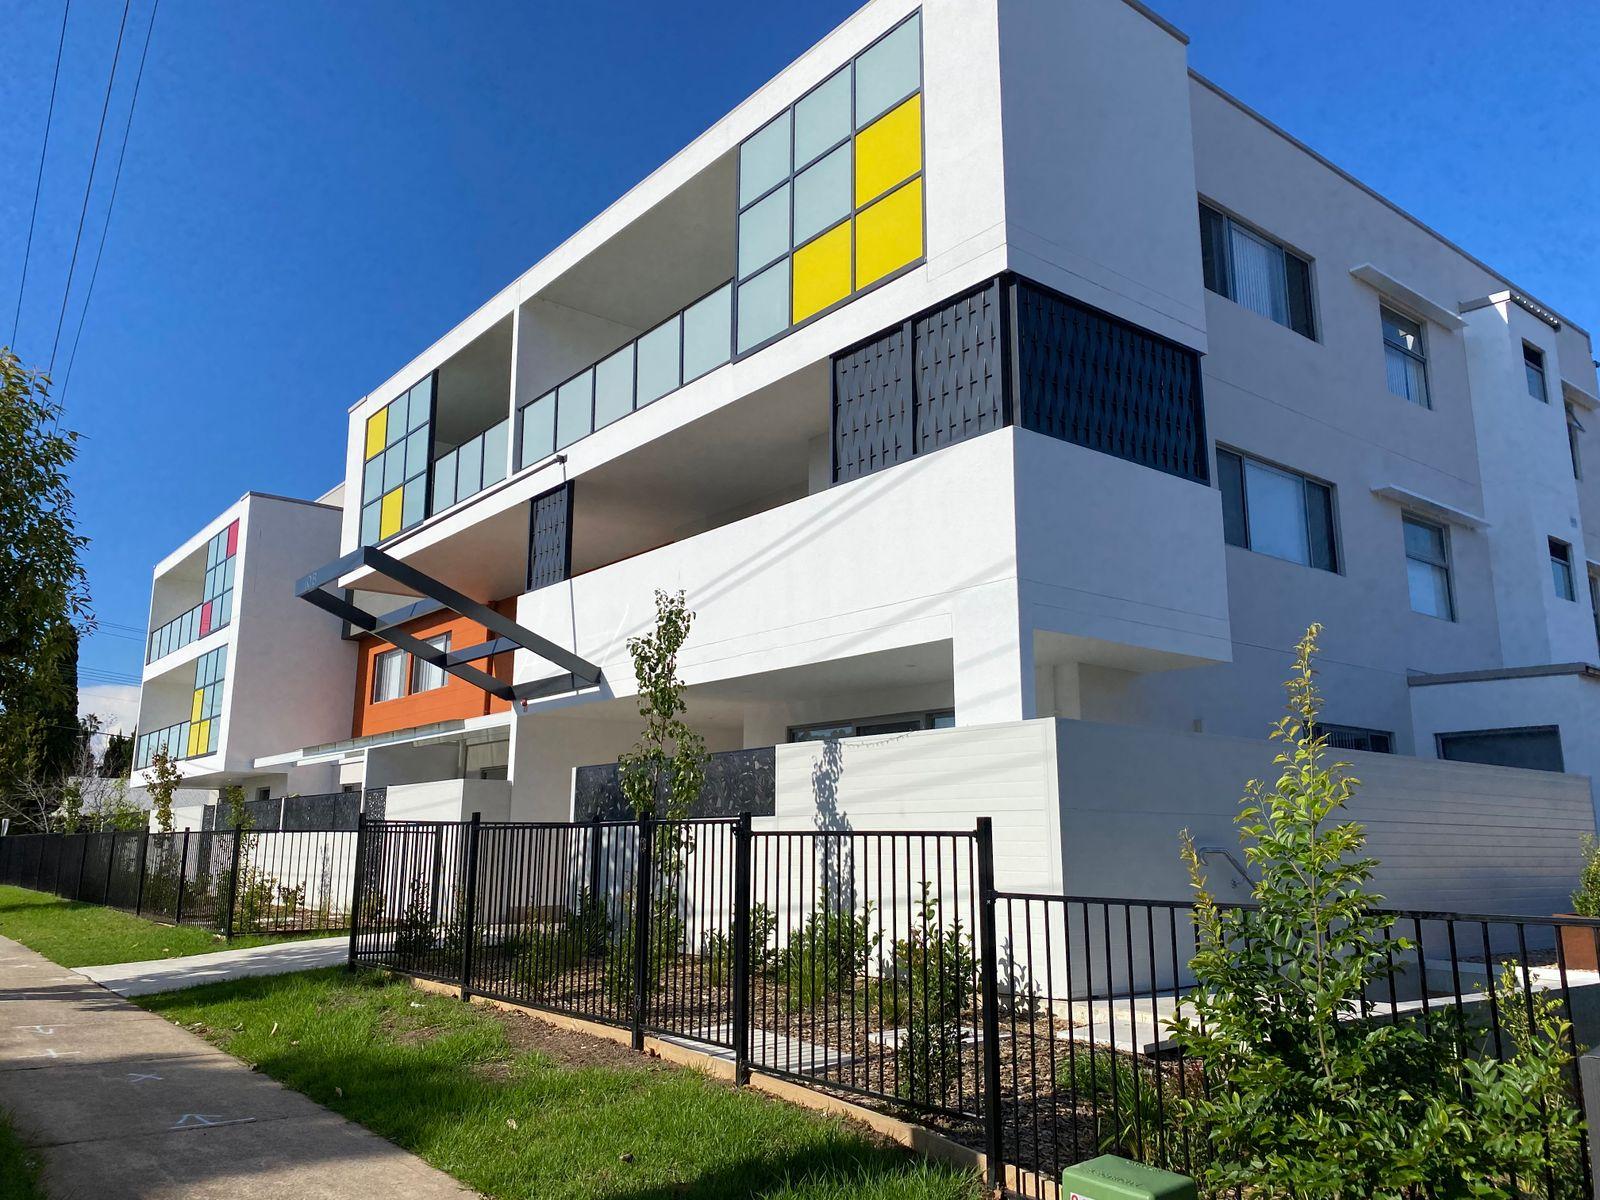 20/108 Lethbridge Street, Penrith, NSW 2750